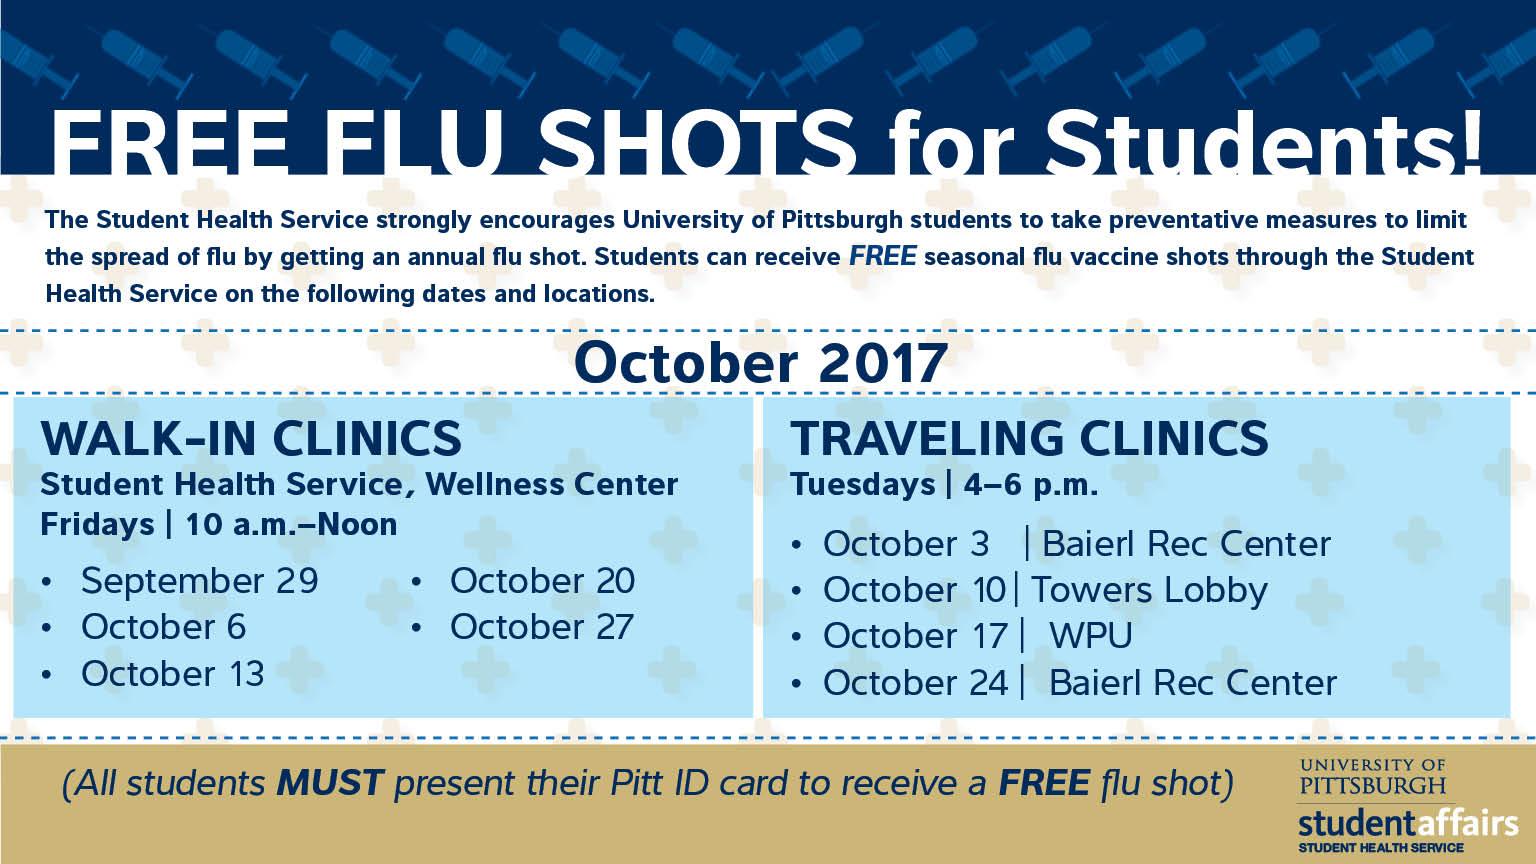 FluClinic_fall17_Oct 24